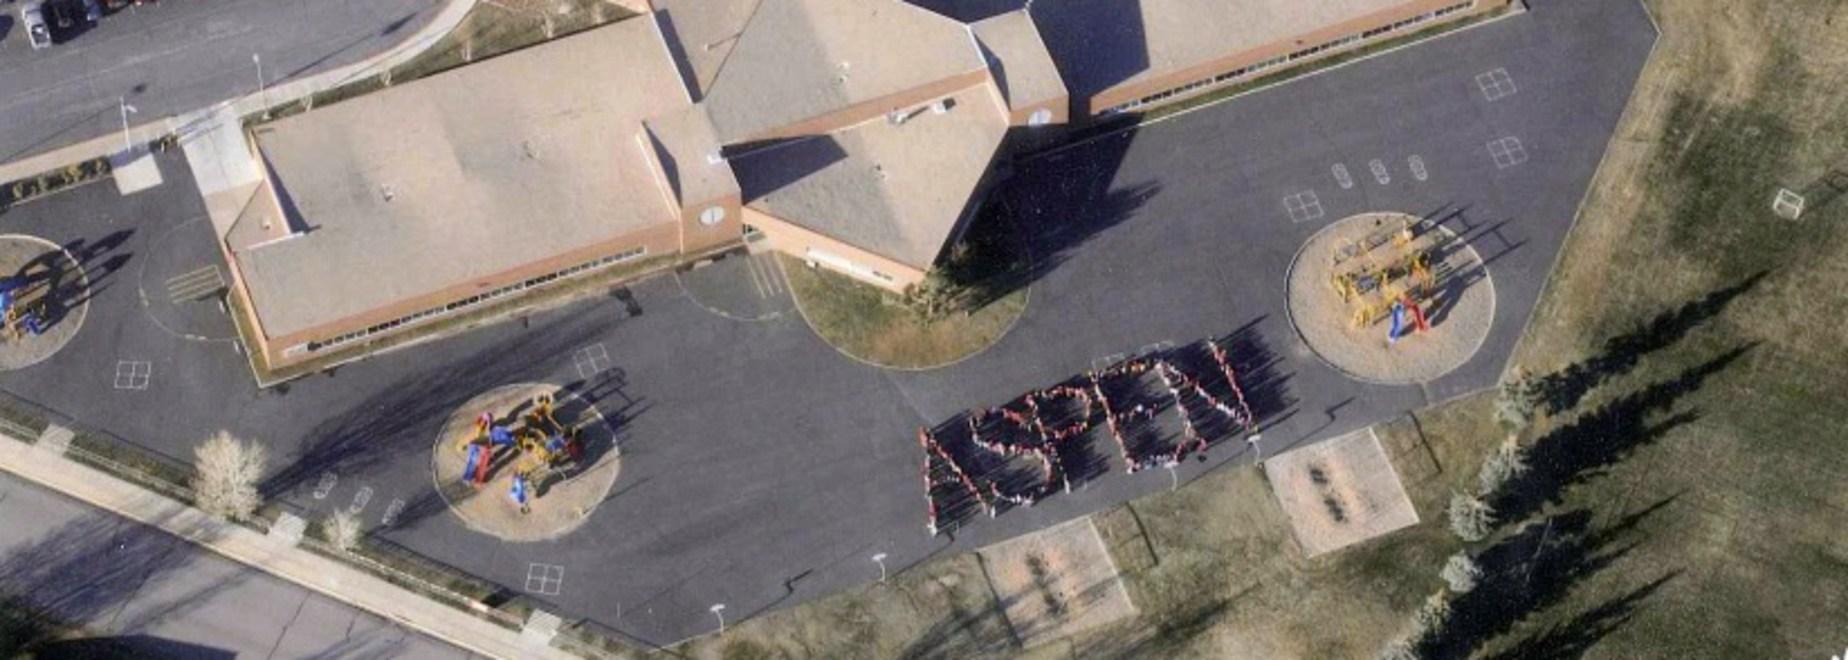 Aspen Elementary